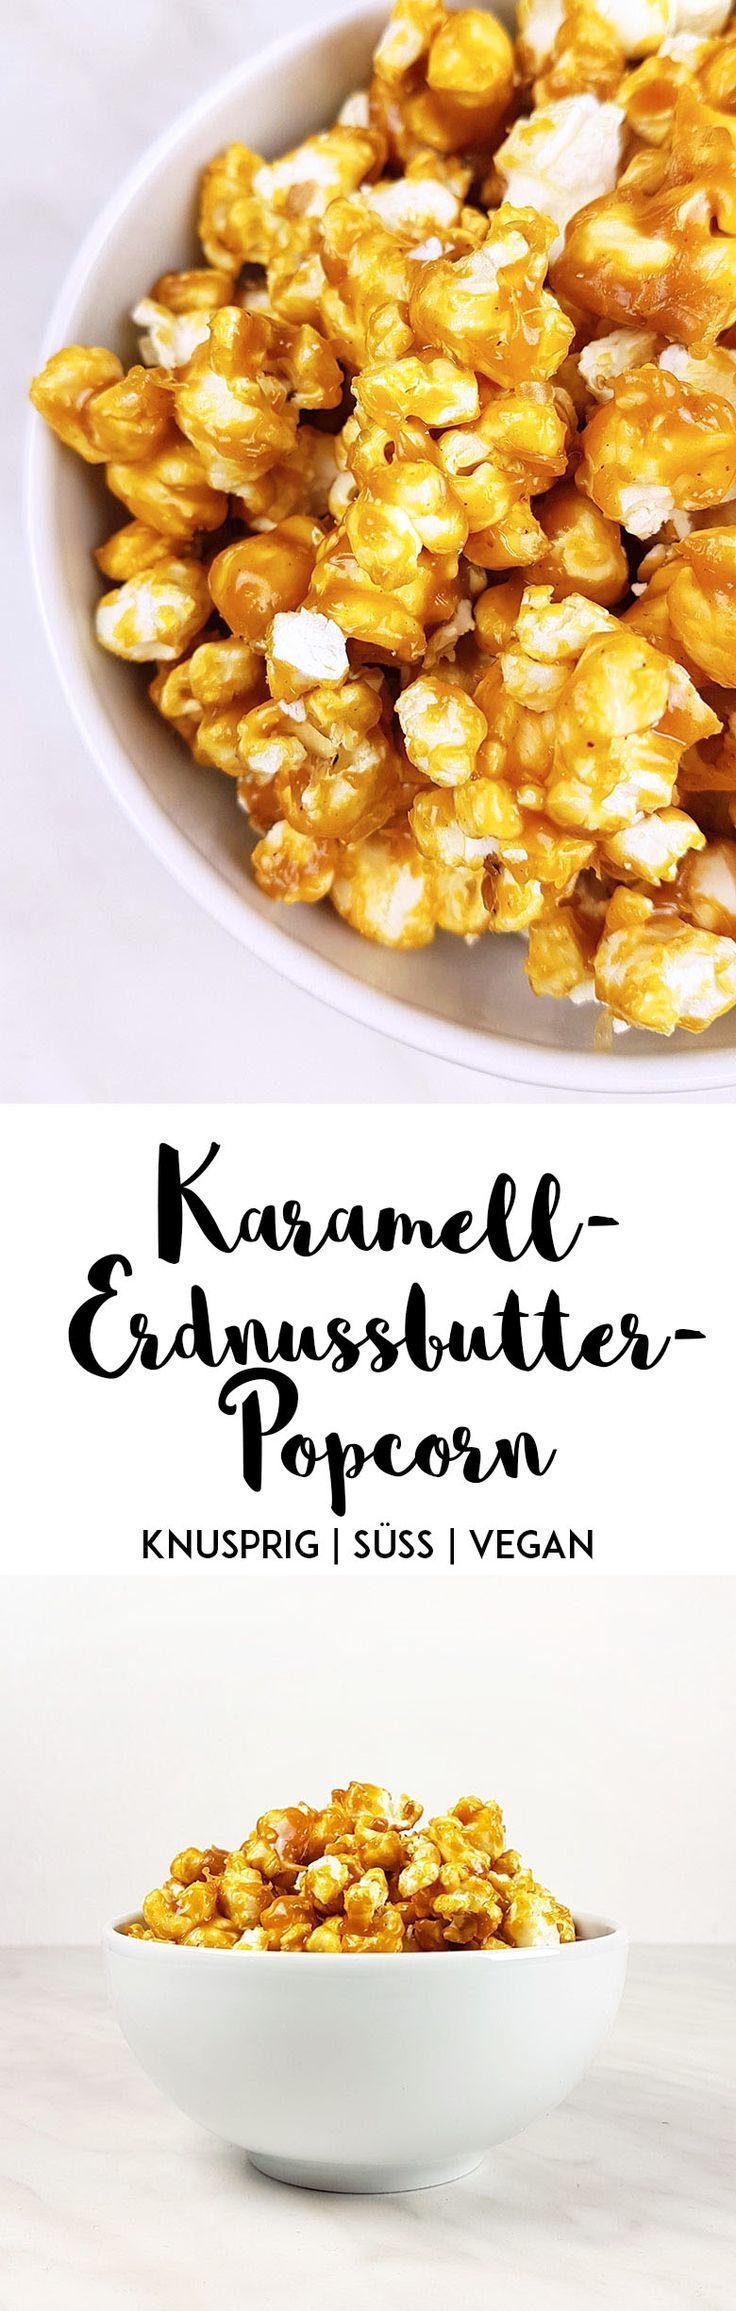 knuspriges karamell erdnussbutter popcorn rezept rezepte erdnussbutter popcorn popcorn. Black Bedroom Furniture Sets. Home Design Ideas